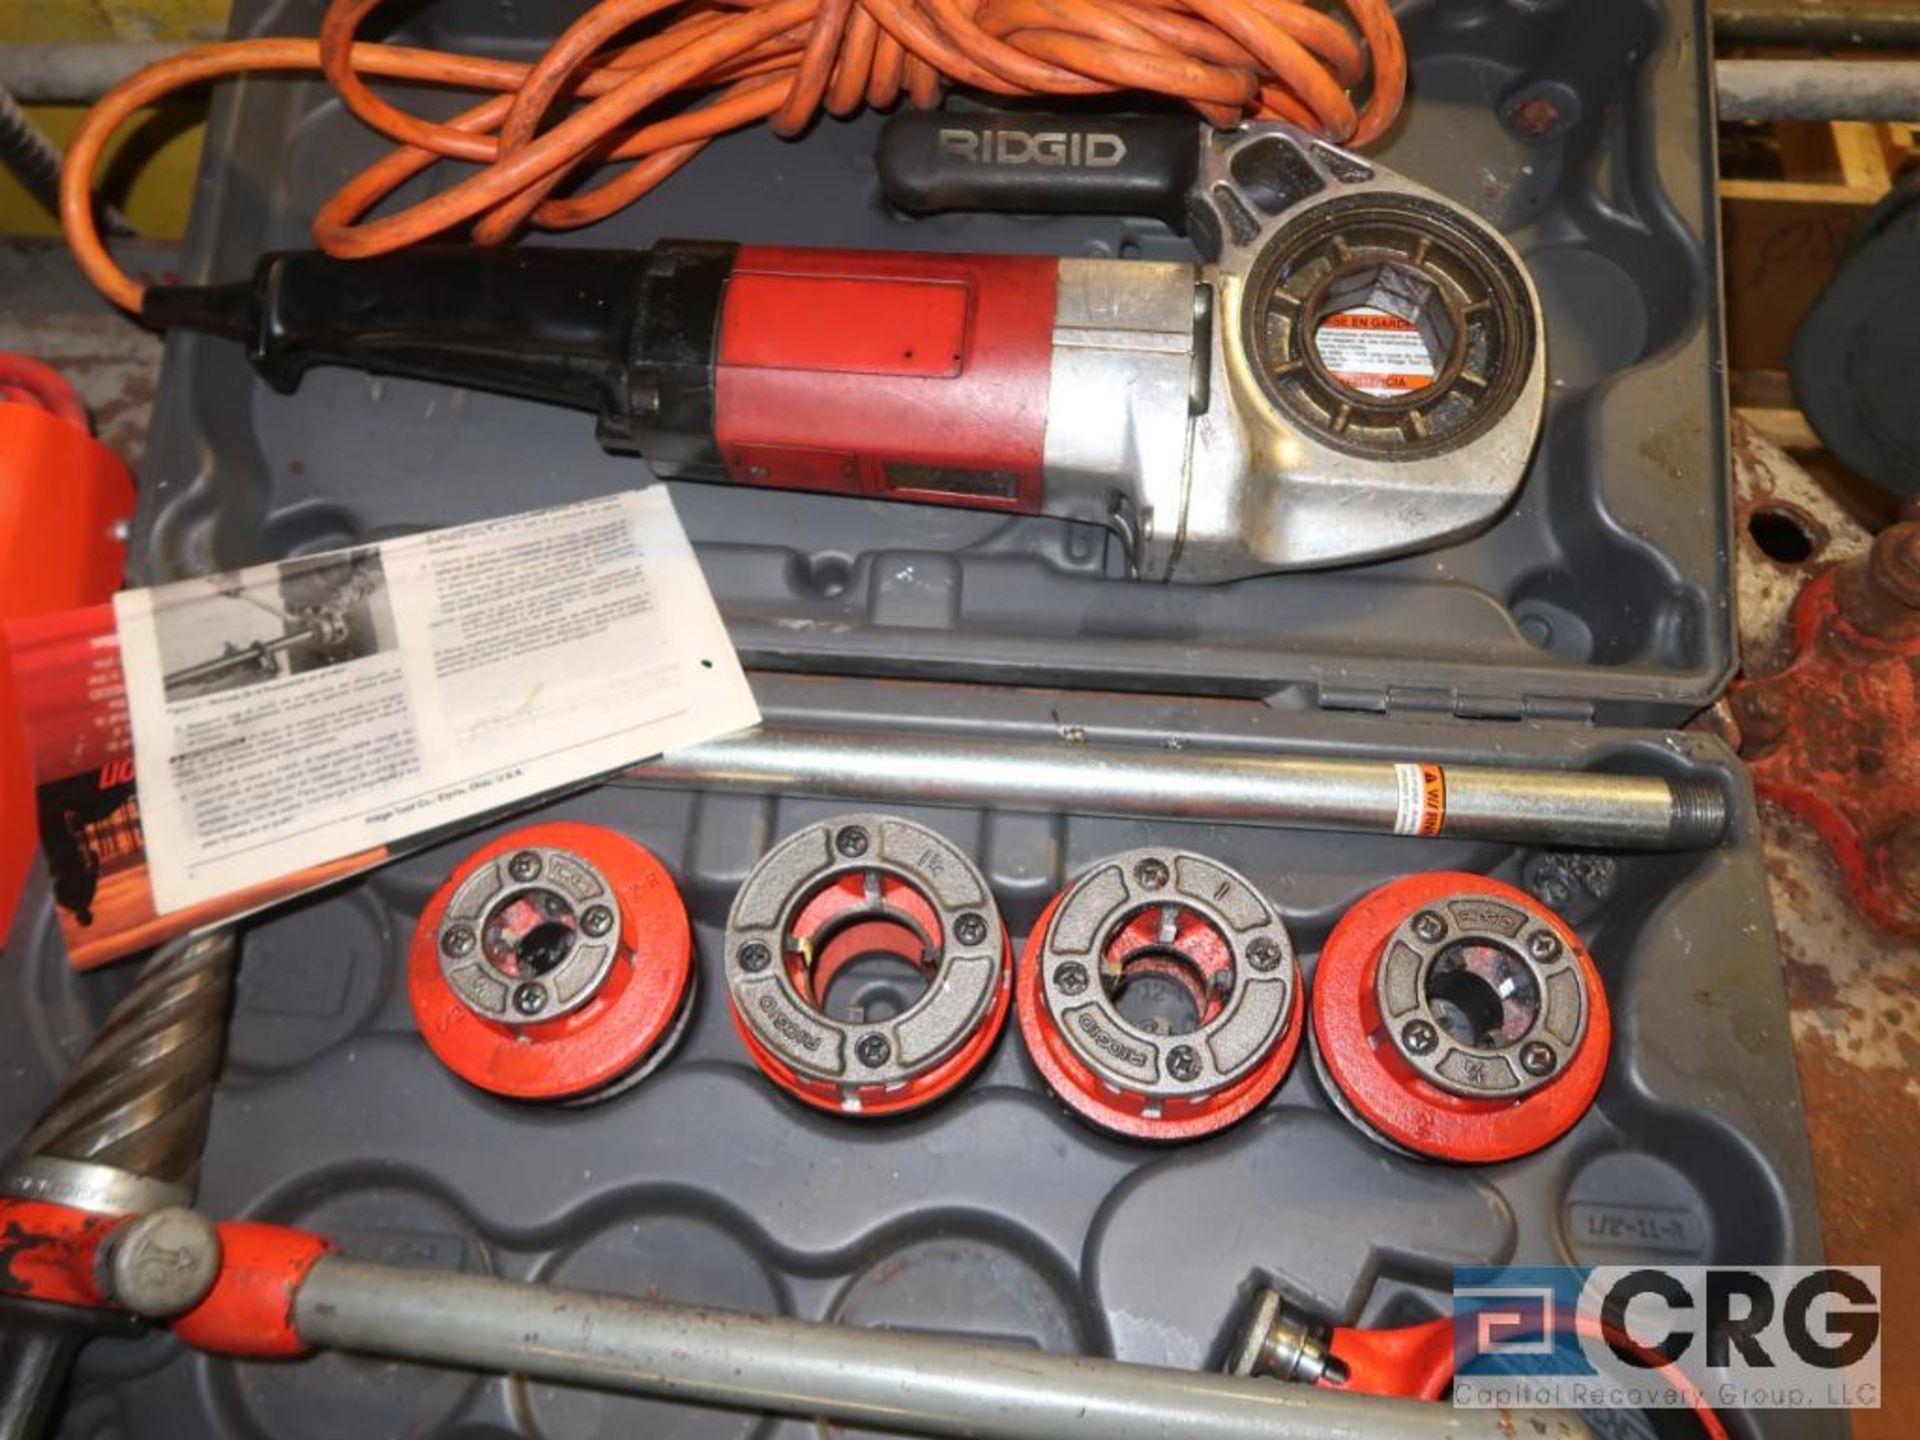 Lot of Ridgid threading tools including (1) model 600 electric handheld, (1) manual set, (4) - Image 3 of 4